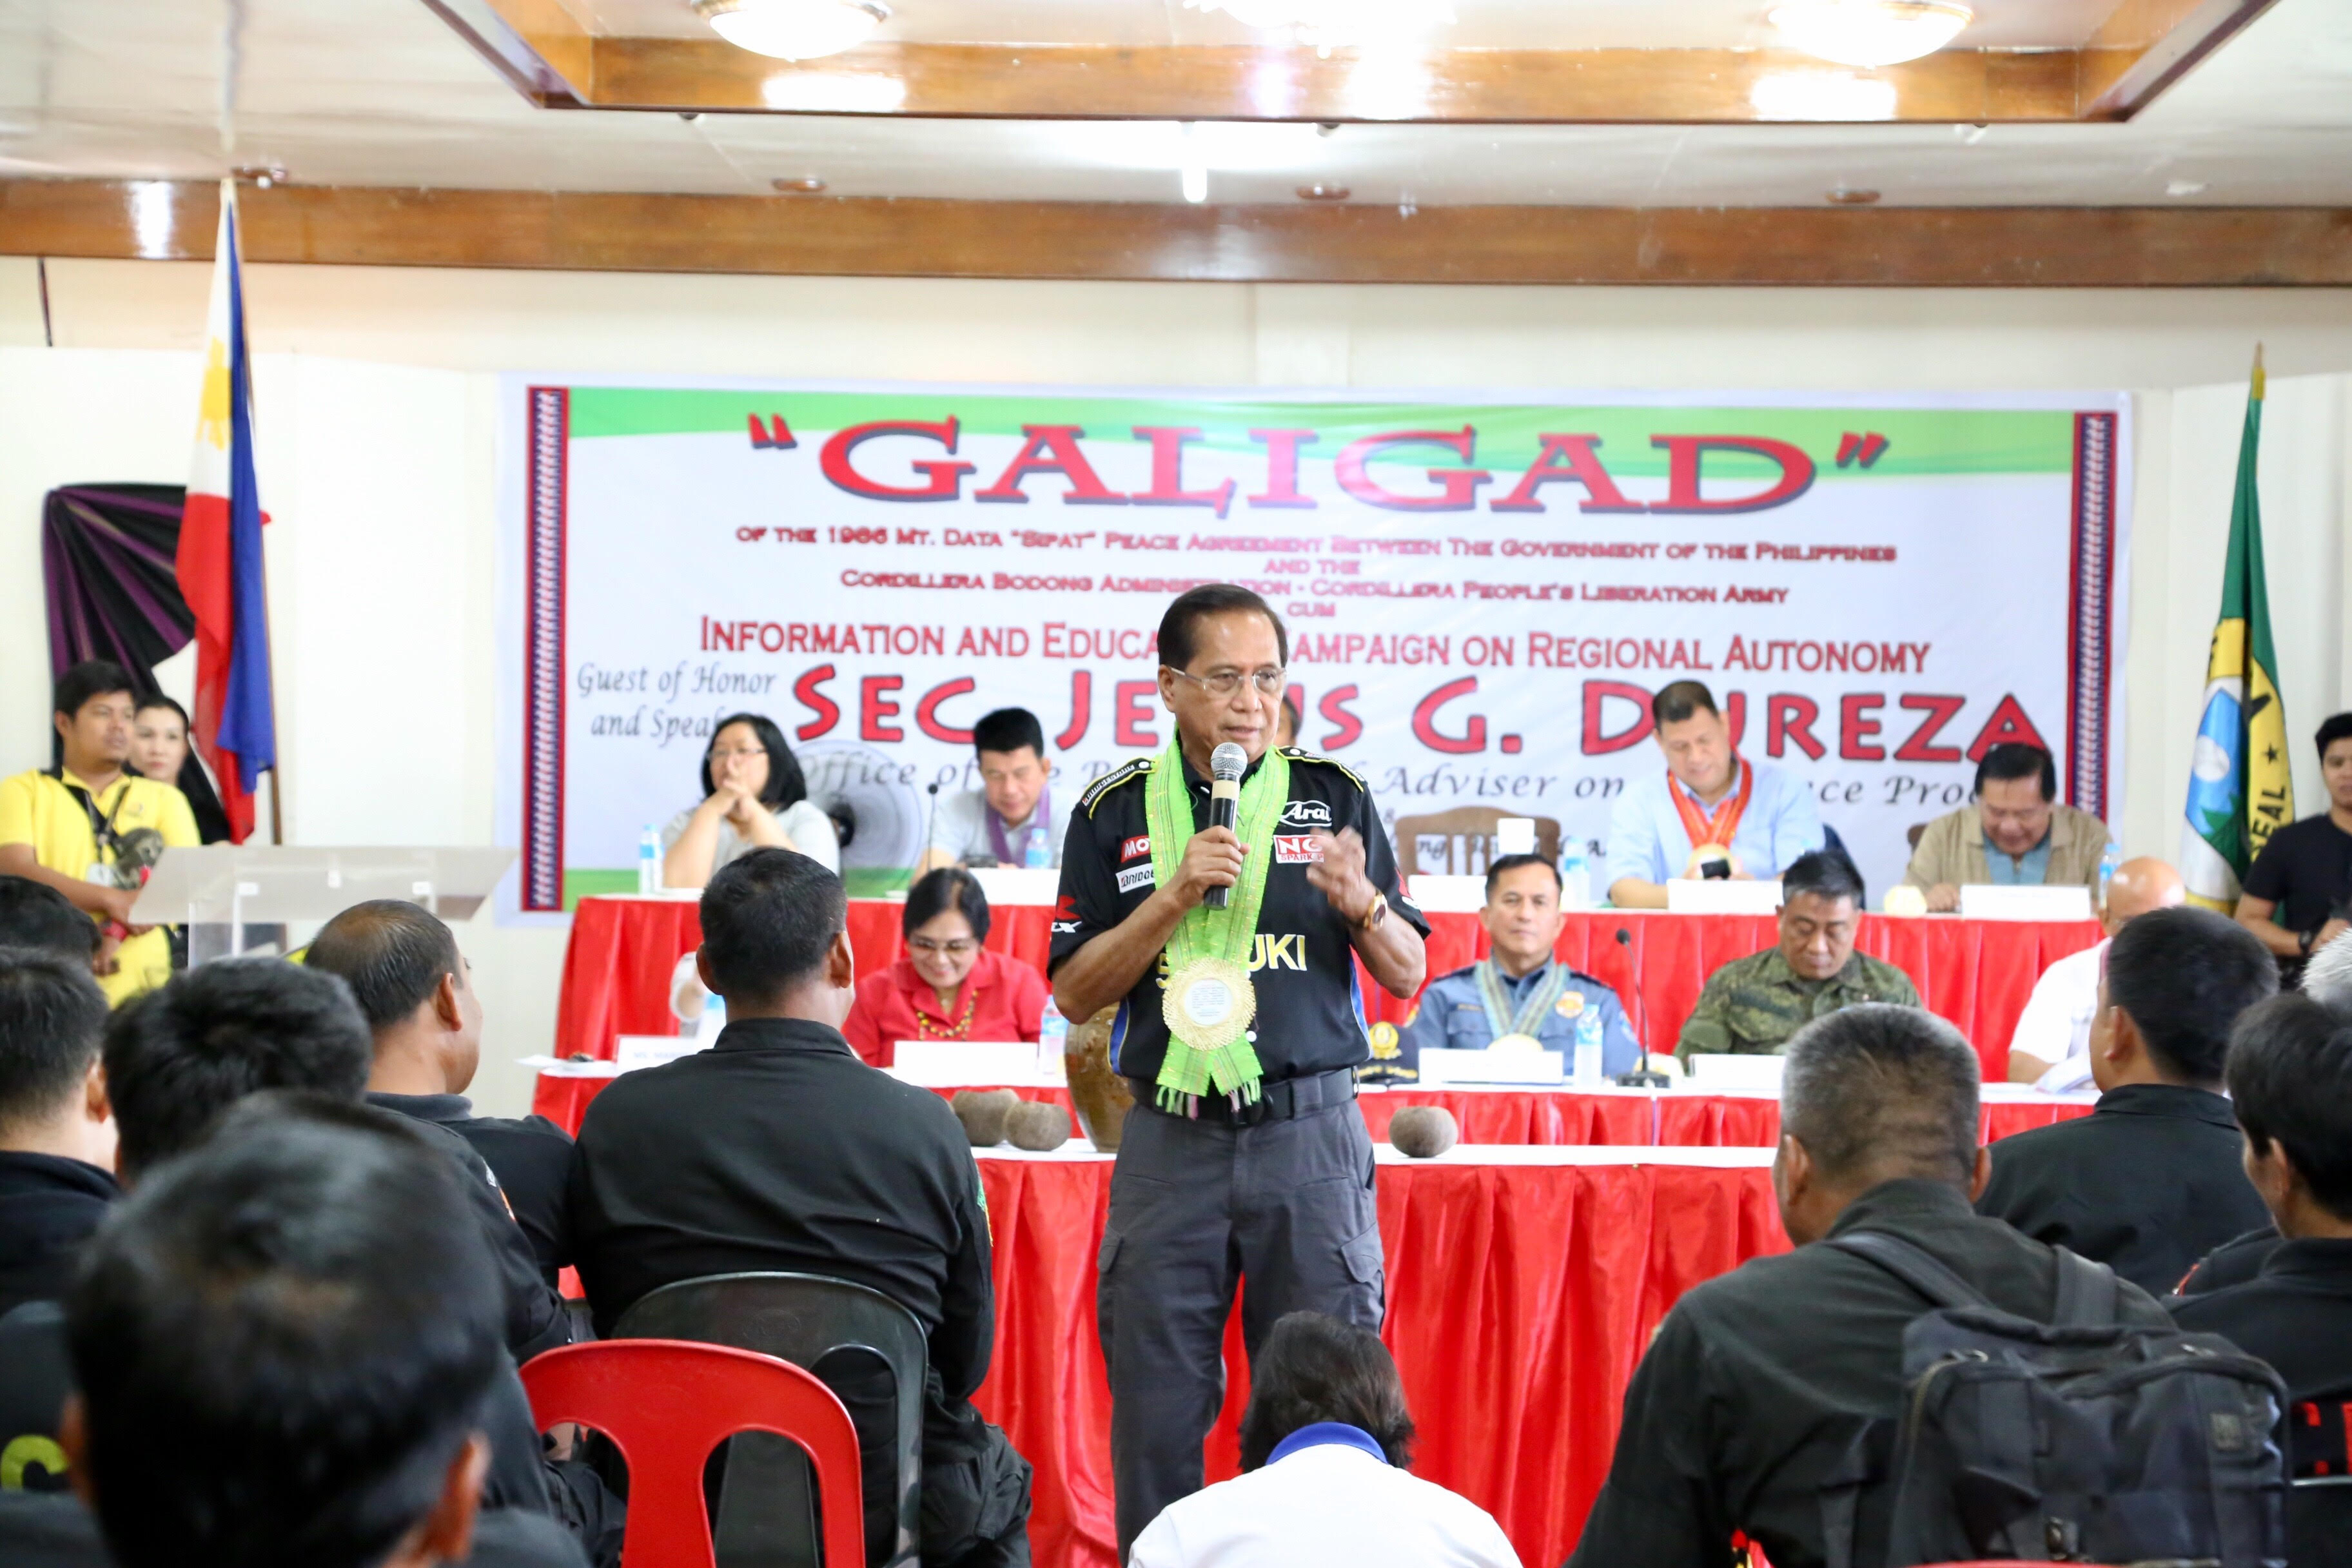 Reintegration of former combatants highlights Cordi groups' assembly